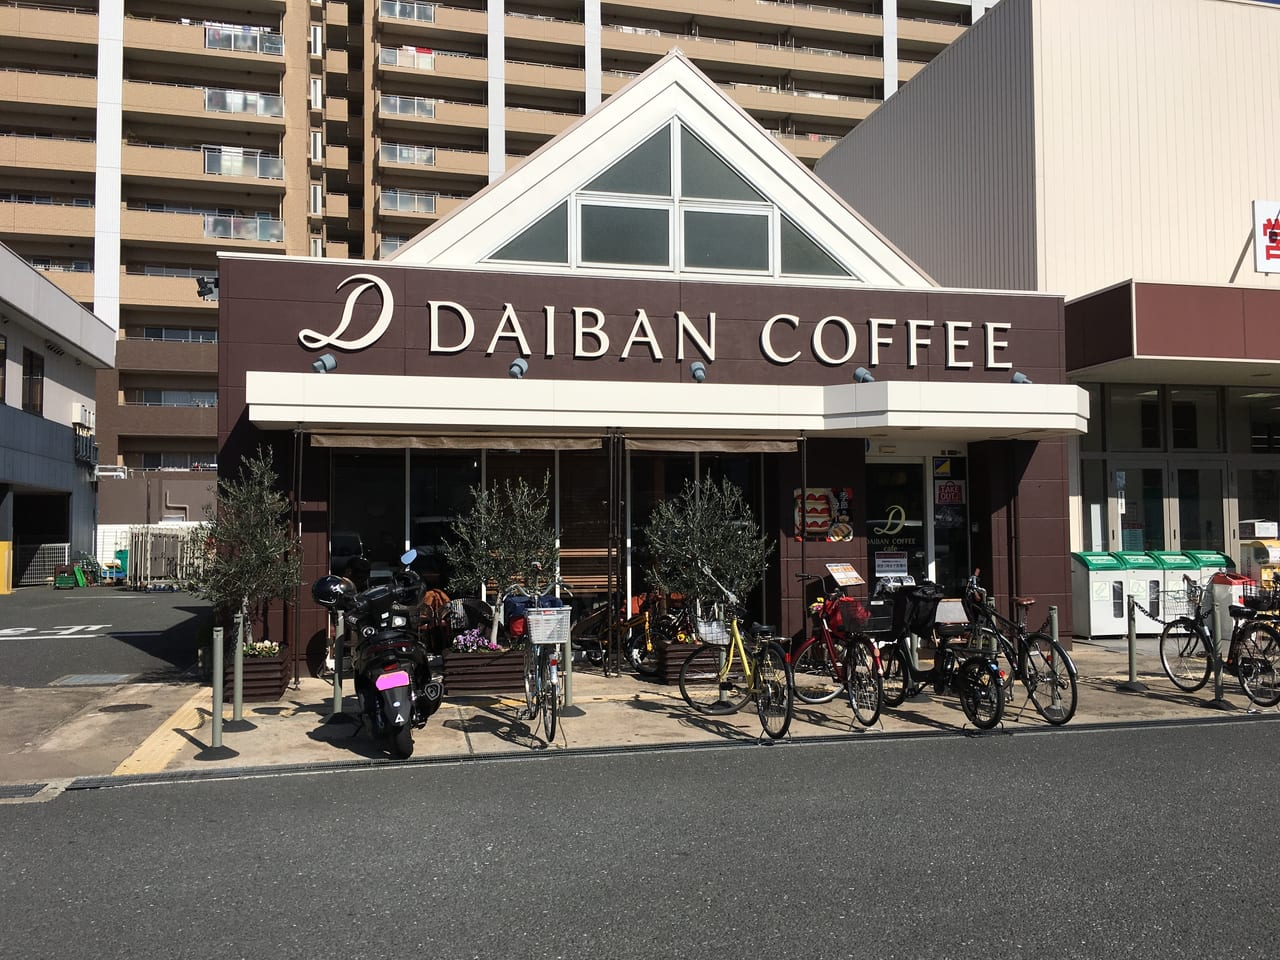 daibancoffe